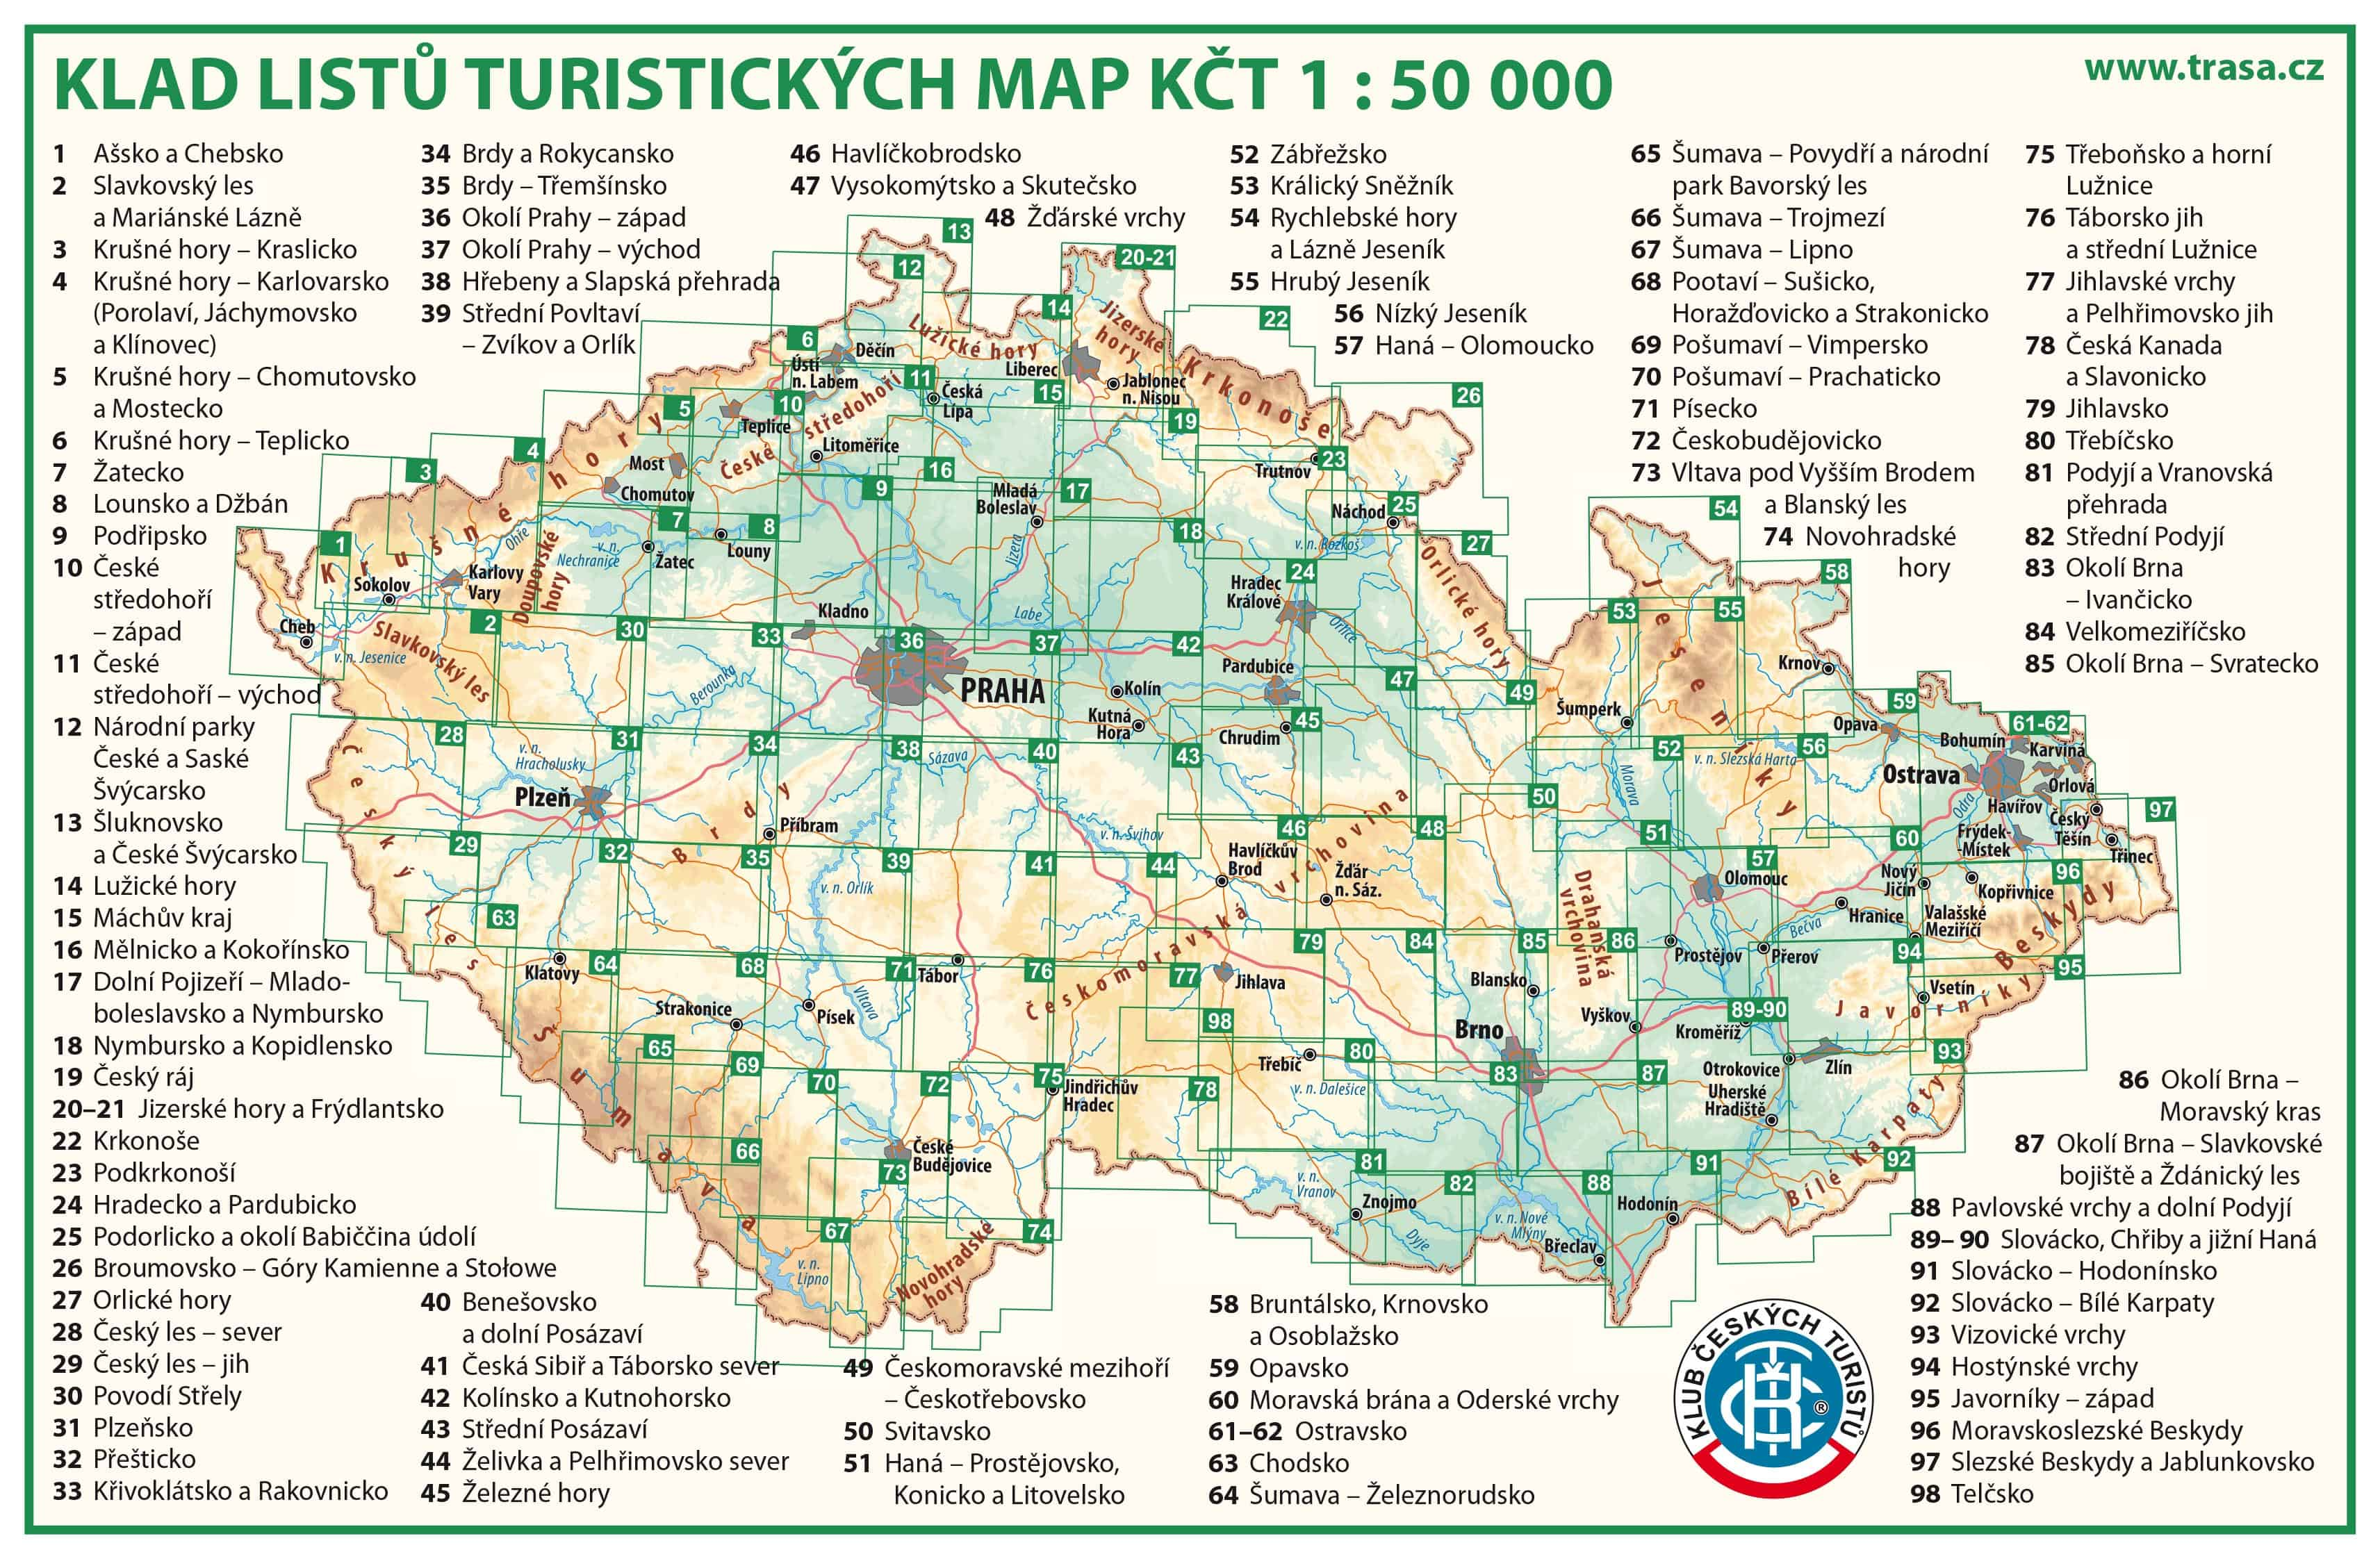 Turisticka Mapa Cr Online Offline Do Mobilu Papirove Ke Stazeni